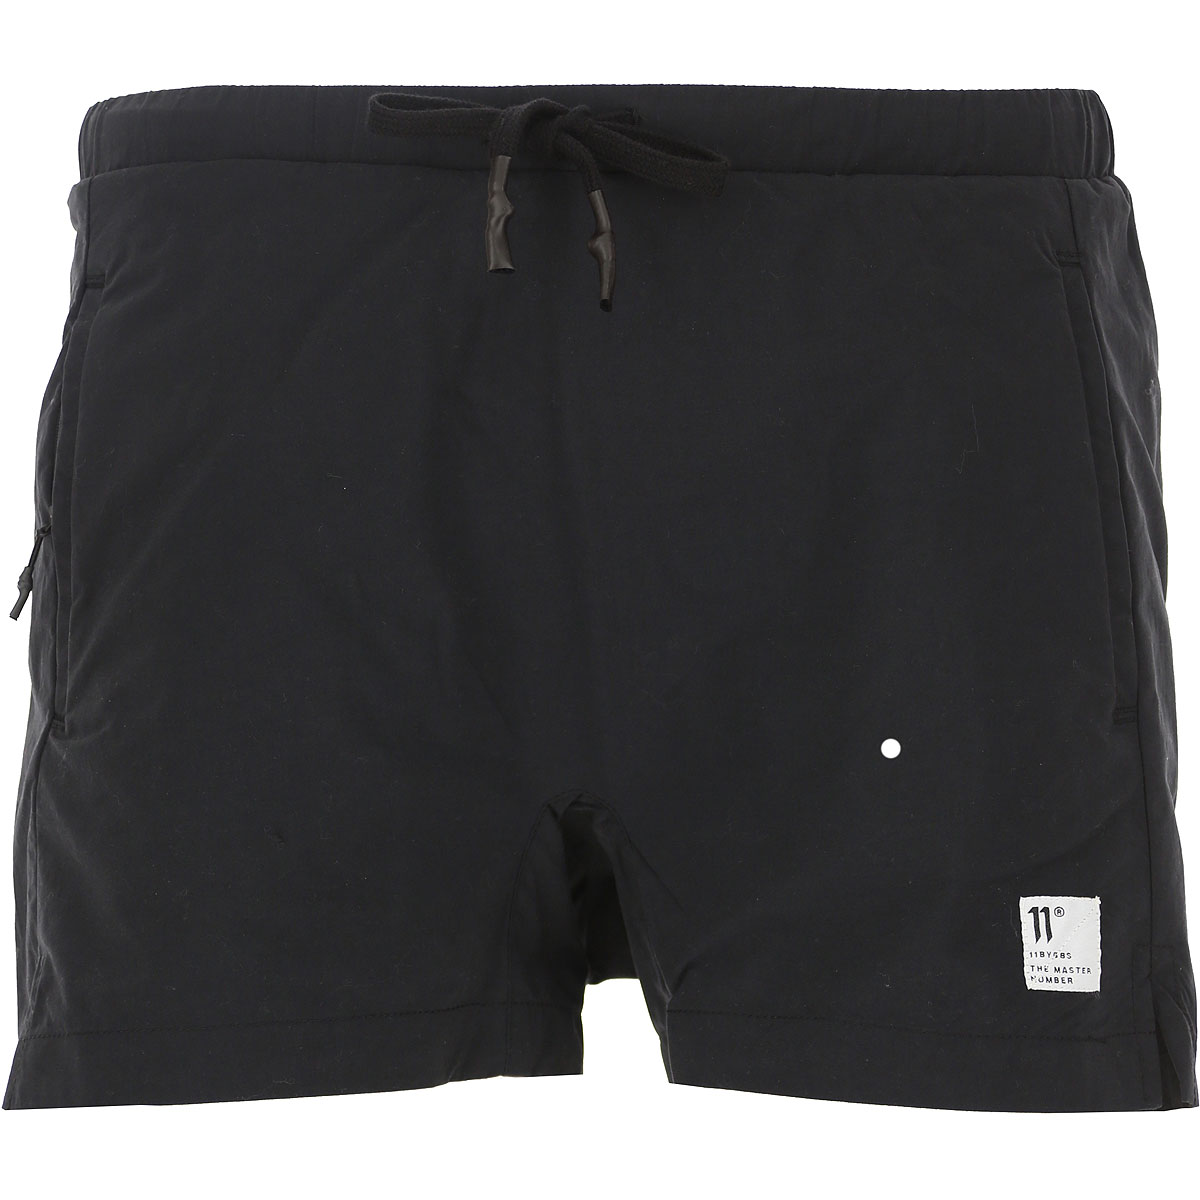 11 BY BORIS BIDJAN SABERI Swimwear, Black, polyamide, 2017, L M S